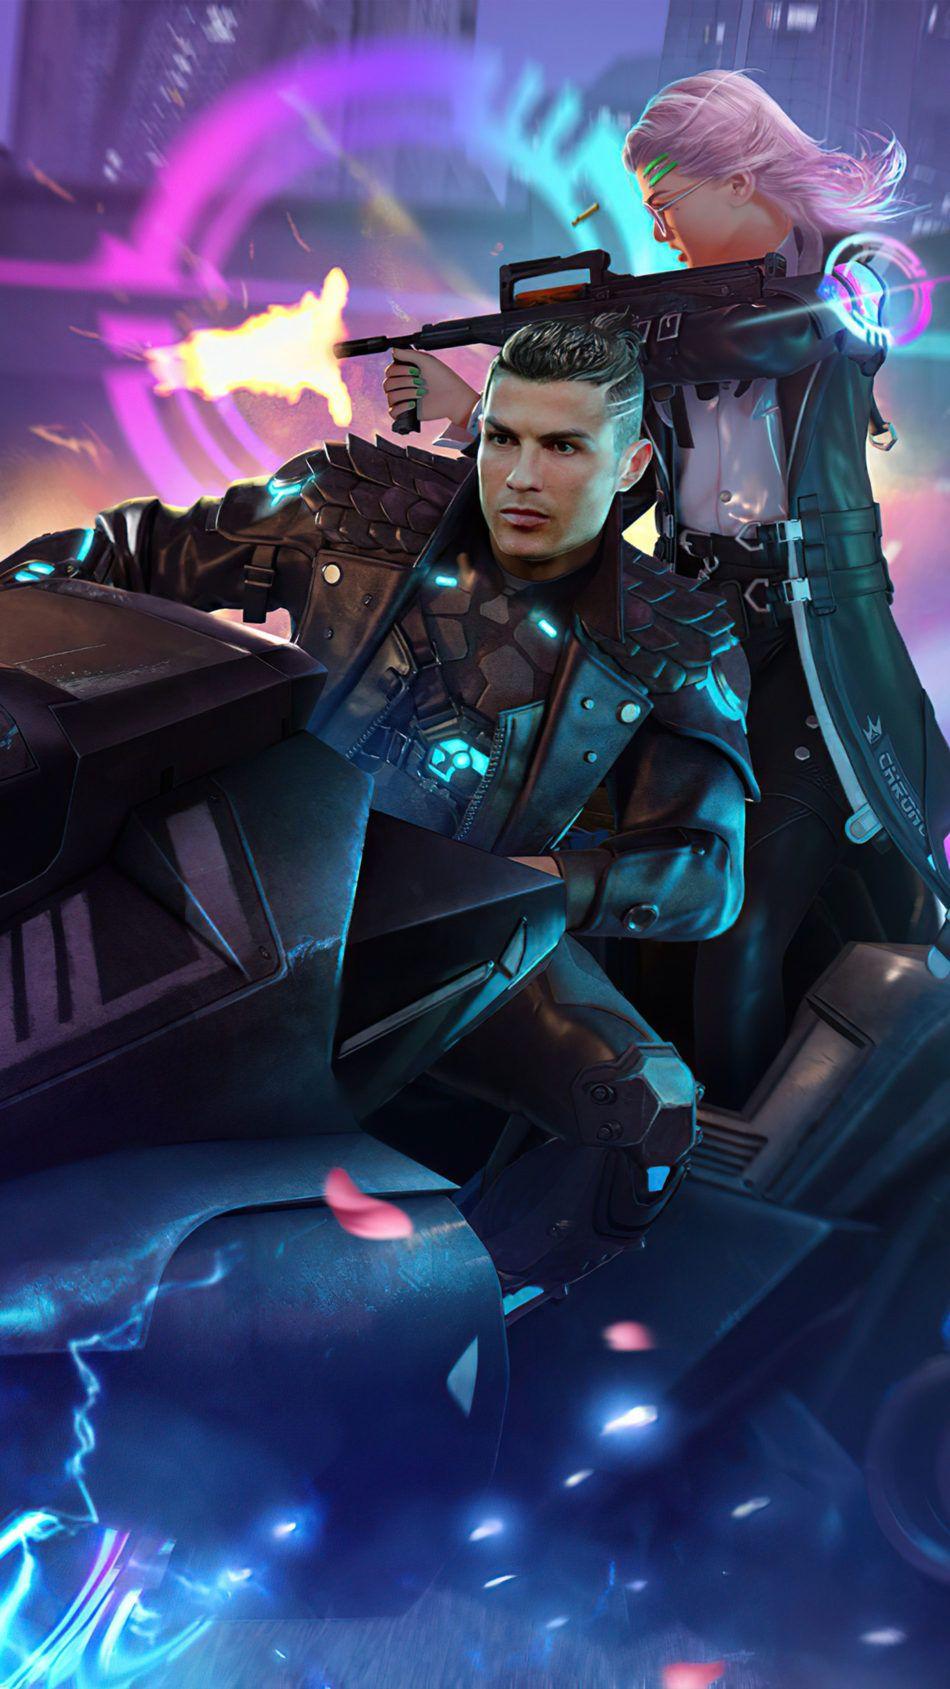 Cristiano Ronaldo Garena Free Fire Skin 4k Ultra Hd Mobile Wallpaper In 2021 Cristiano Ronaldo Ronaldo Photo Poses For Boy